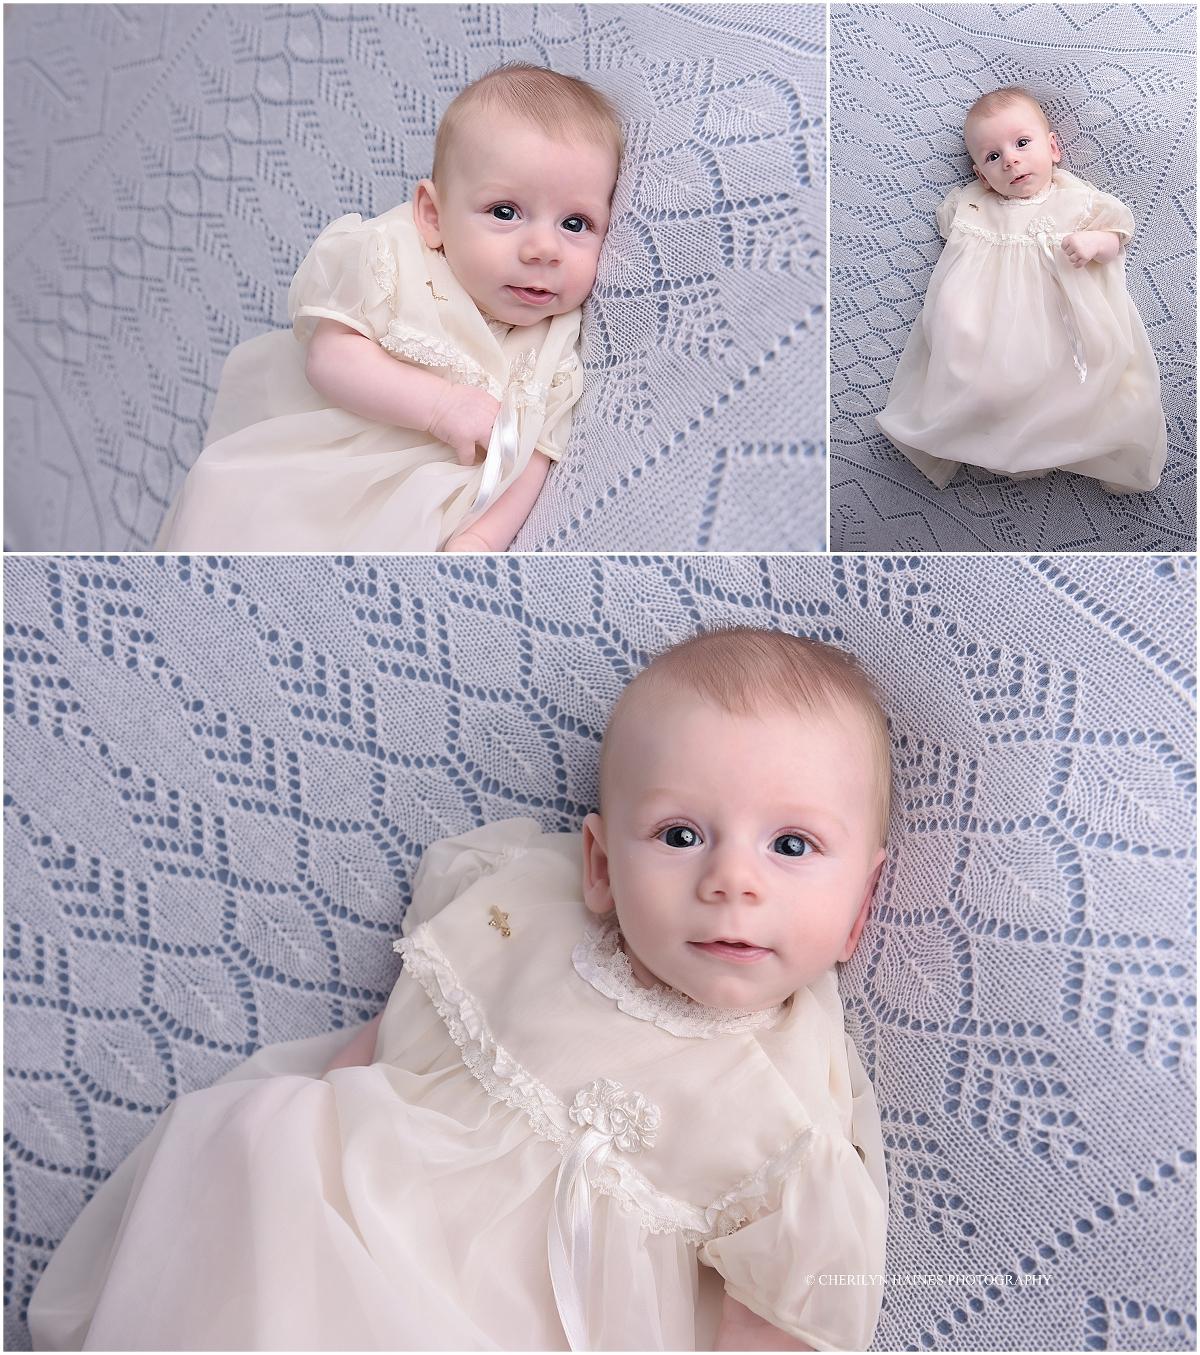 Caleb 4 Months Old Baton Rouge La Baby Plan